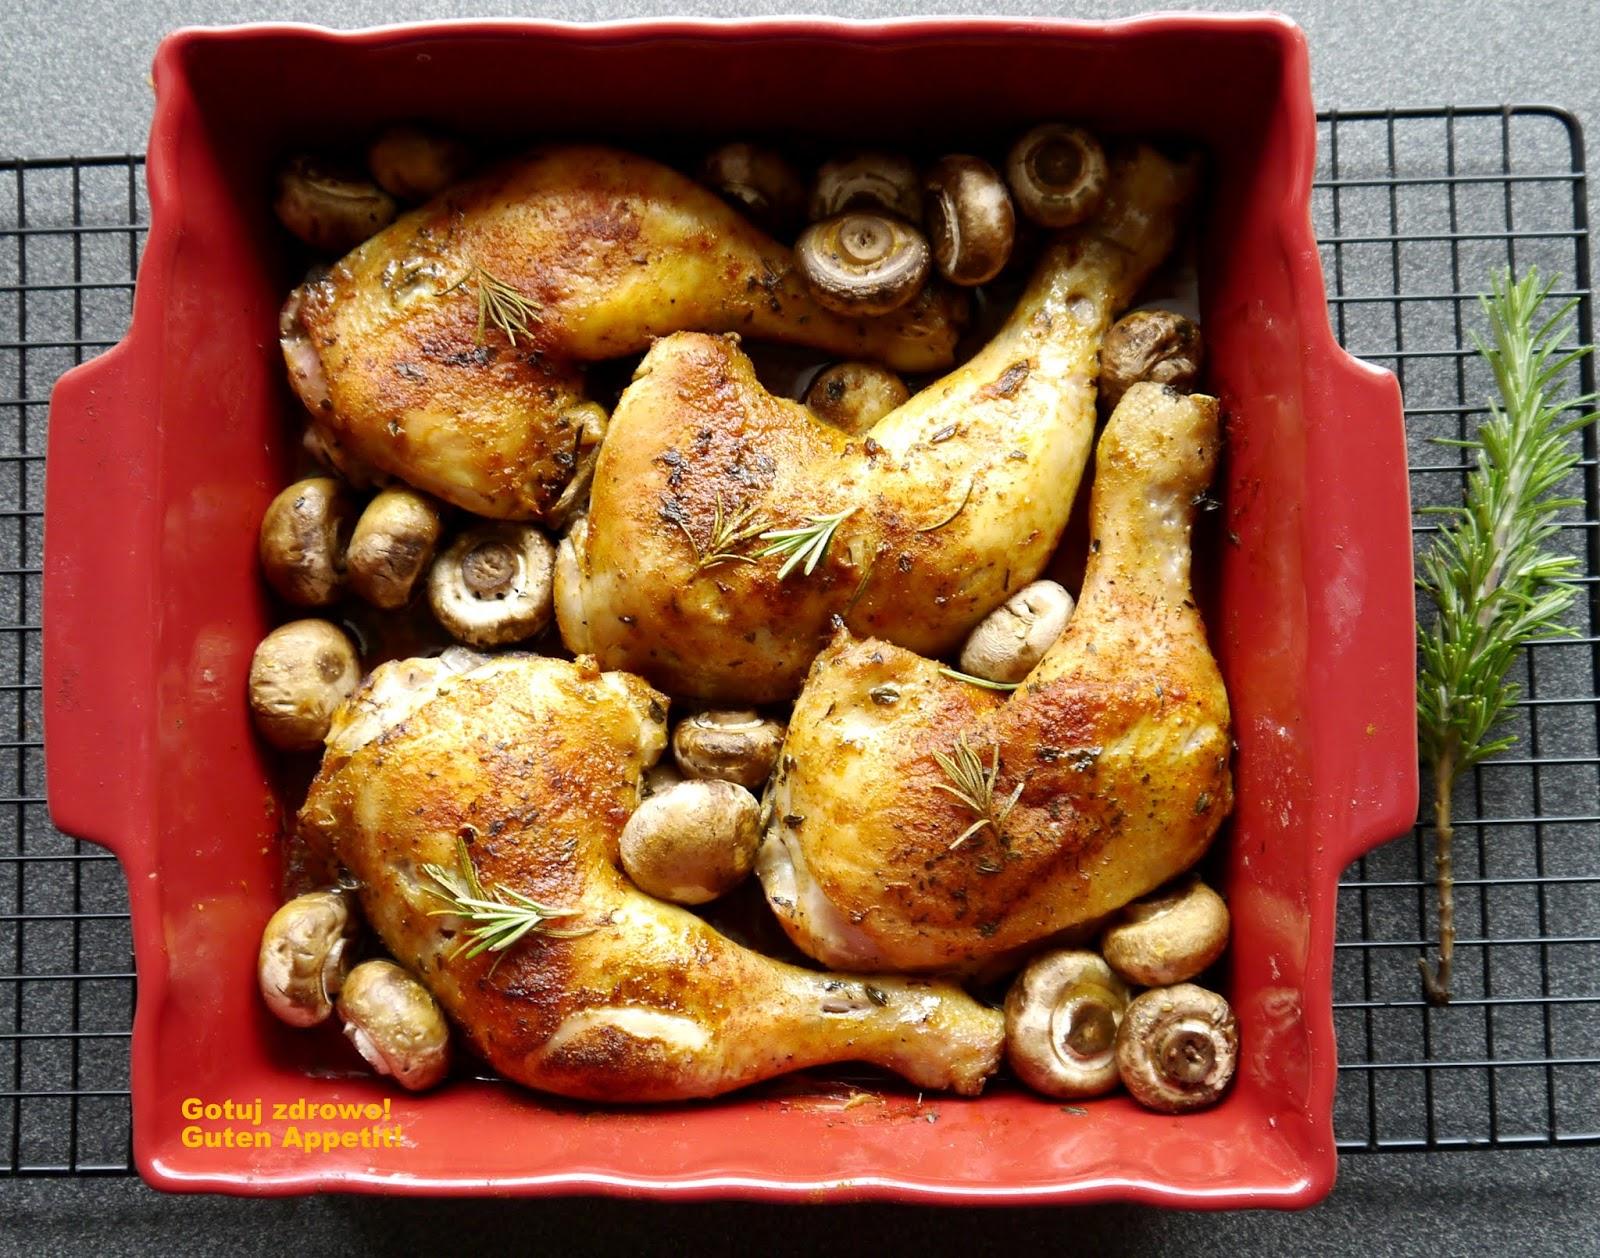 Chrupiace Udka Kurczaka Z Pieczarkami Kulinaria Zblogowani